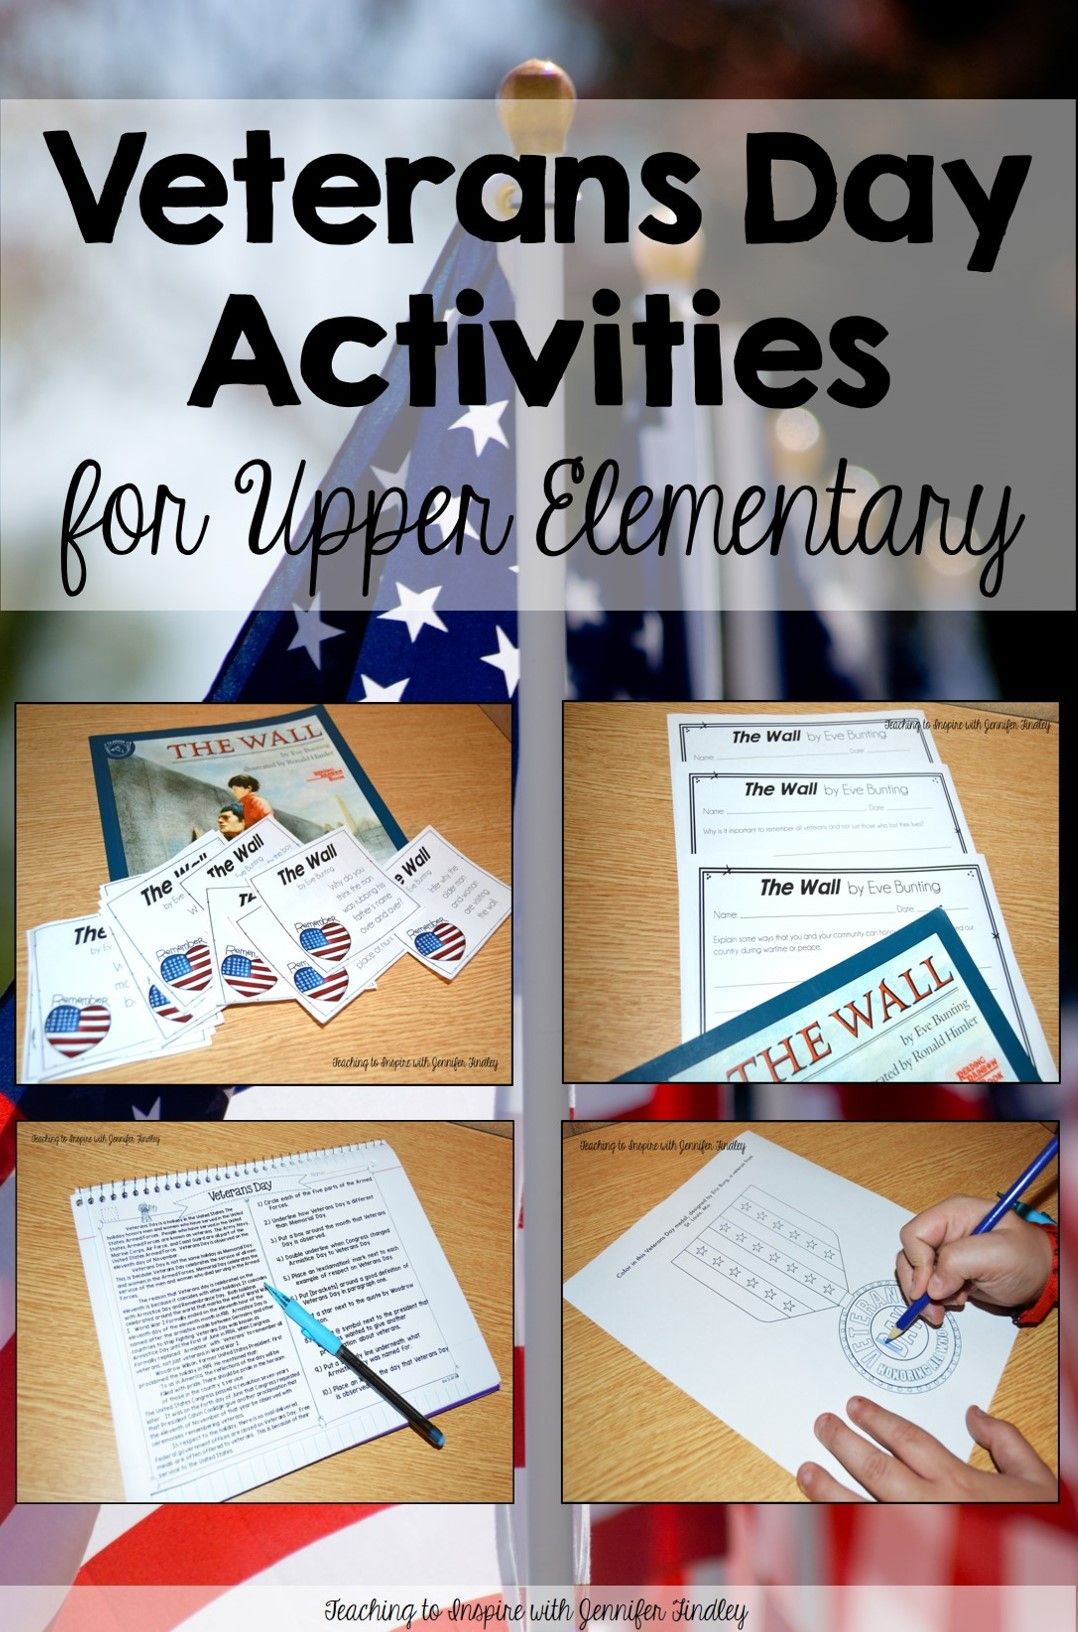 Veterans Day Activities for Upper Elementary